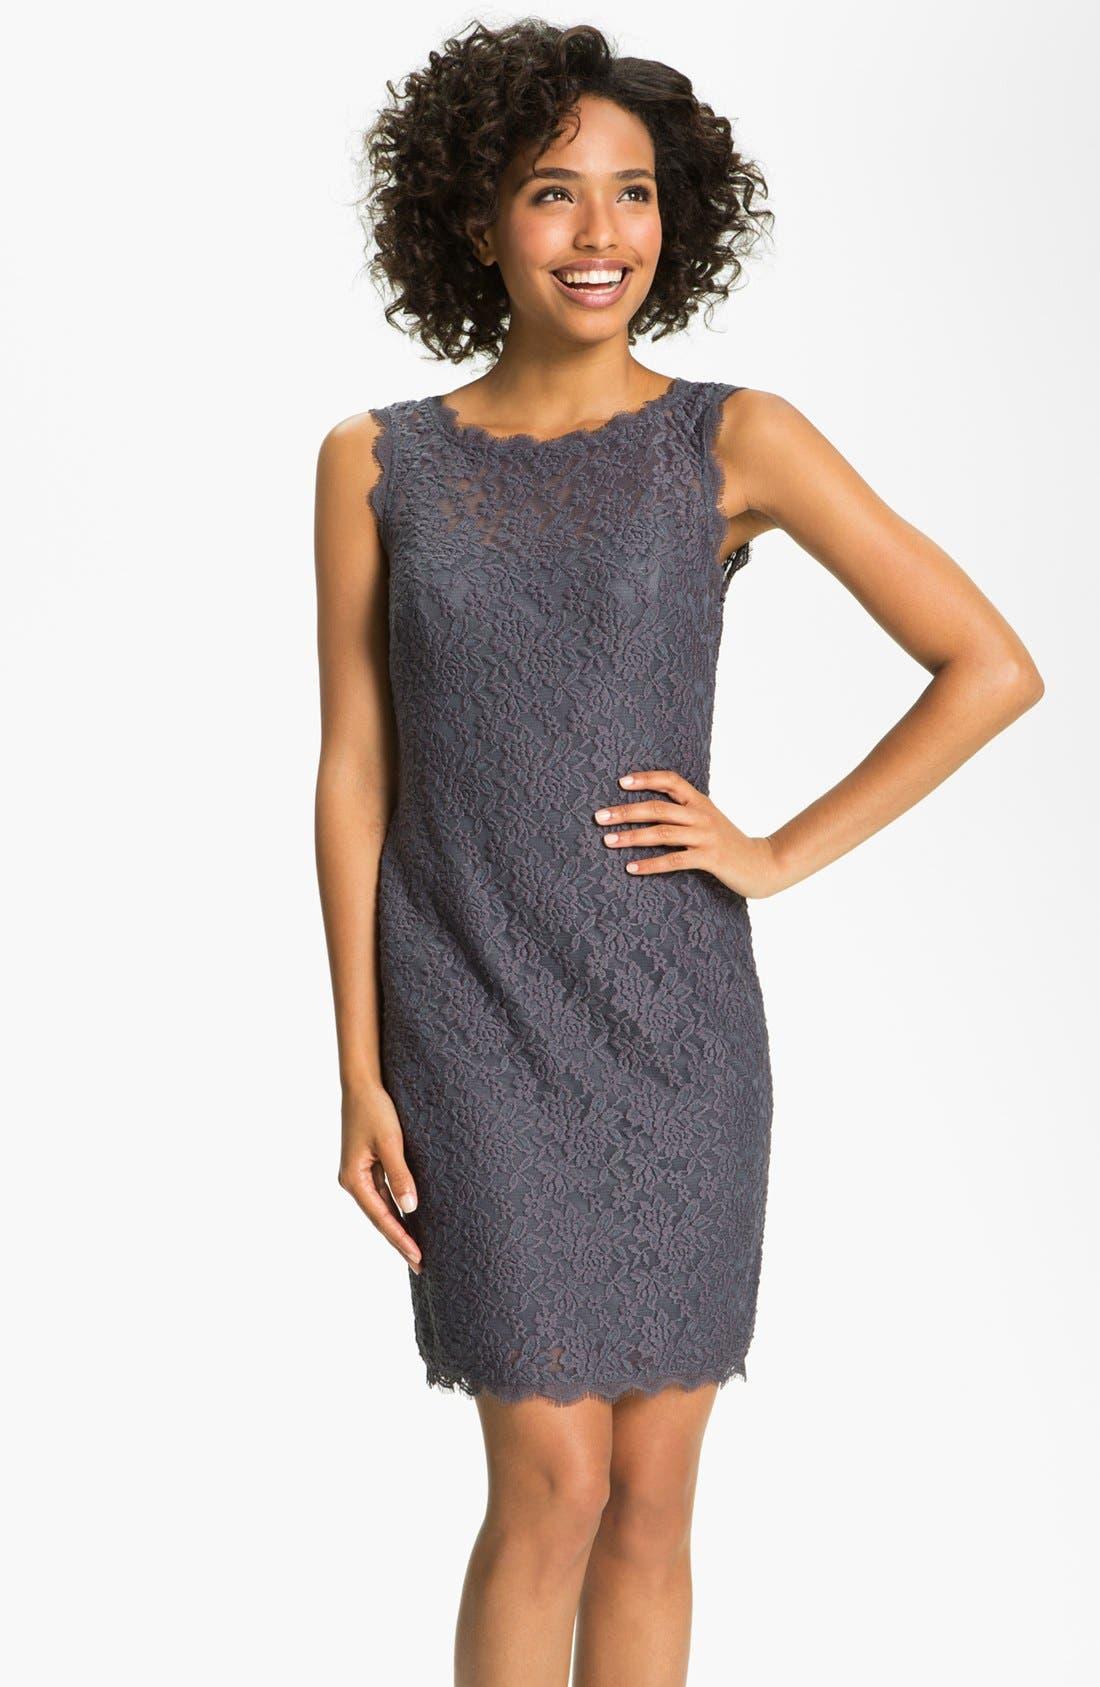 Alternate Image 1 Selected - Adrianna Papell V-Back Lace Sheath Dress (Petite)